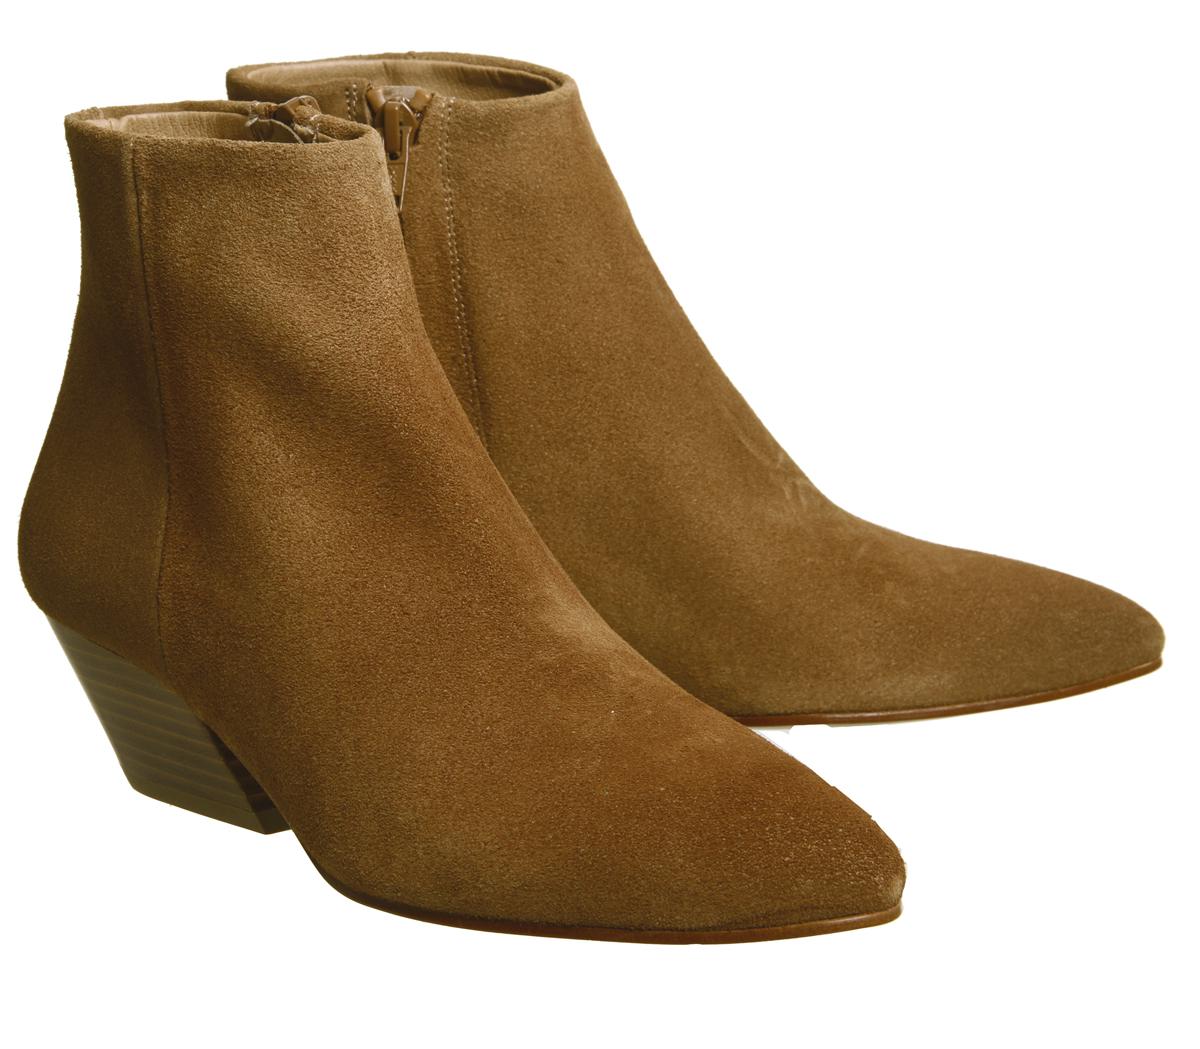 09ef04dedf Womens Office Atone Western Block Heel Boots Tan Suede Boots | eBay